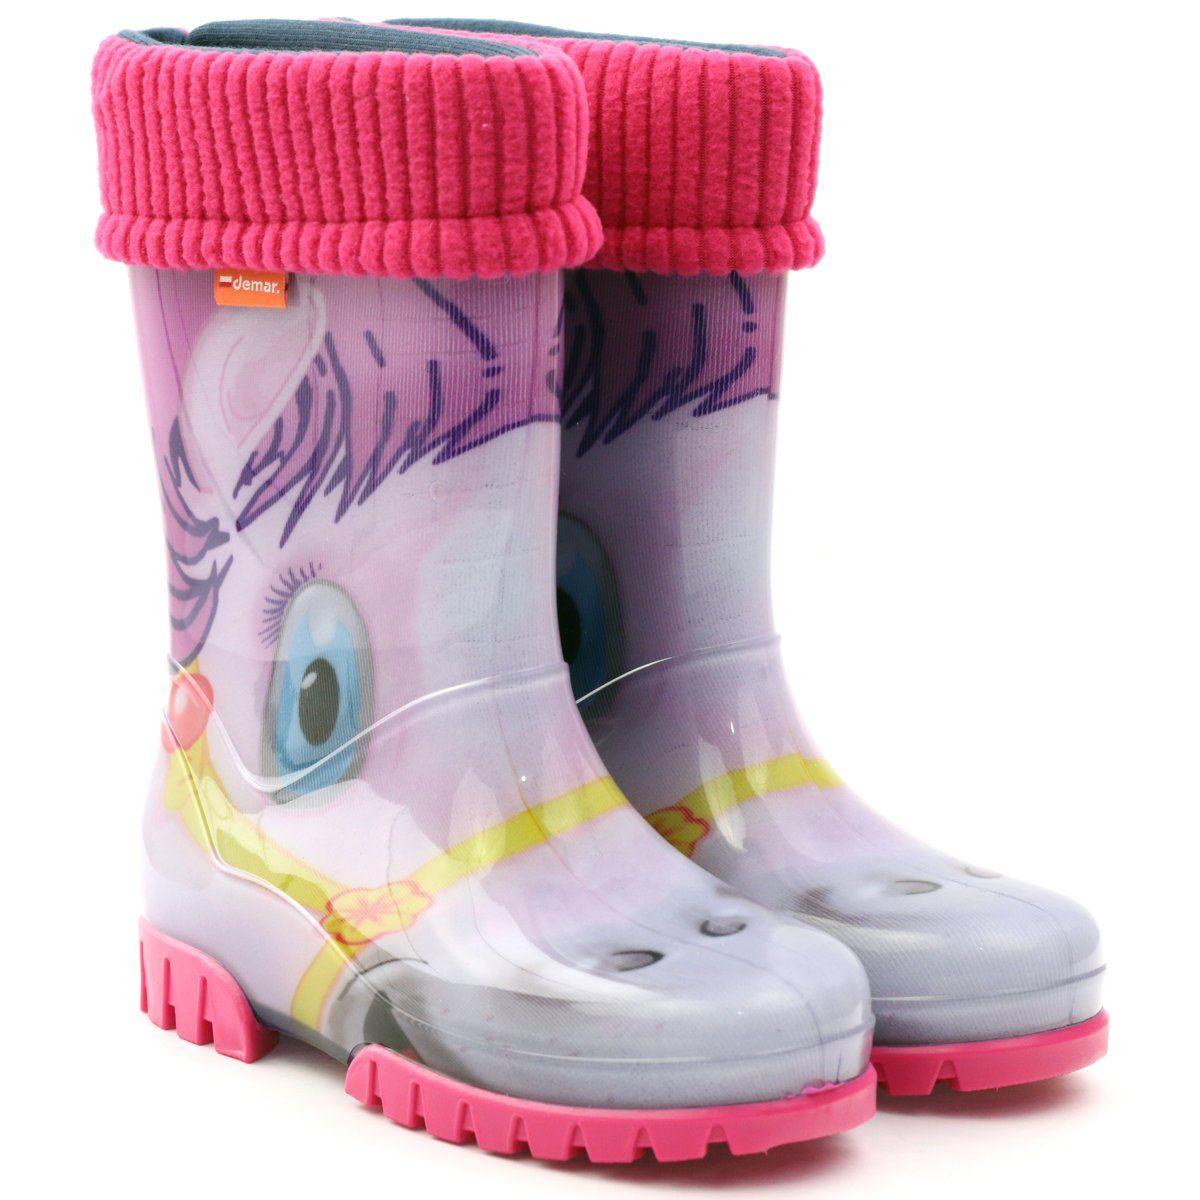 Kalosze Ciepla Skarpeta Demar Konik Granatowe Rozowe Zolte Szare Niebieskie Fioletowe Rain Boots Rubber Rain Boots Boots